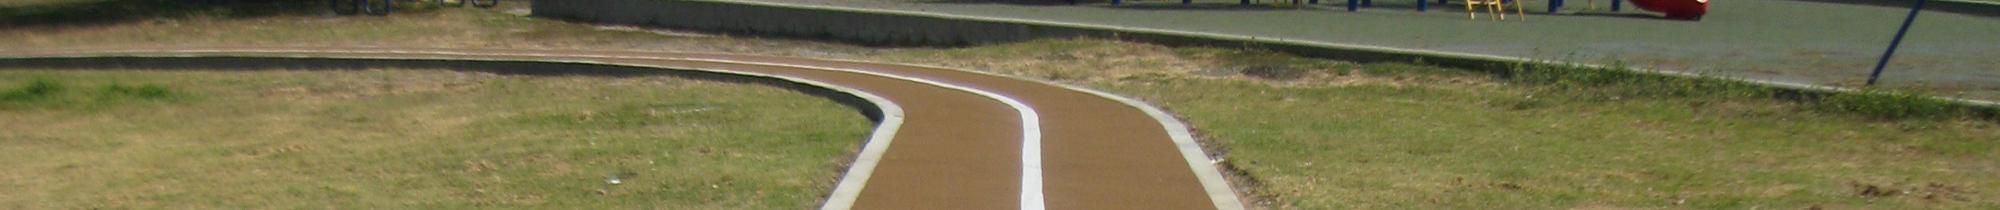 Rubber Running Track at Elementary School